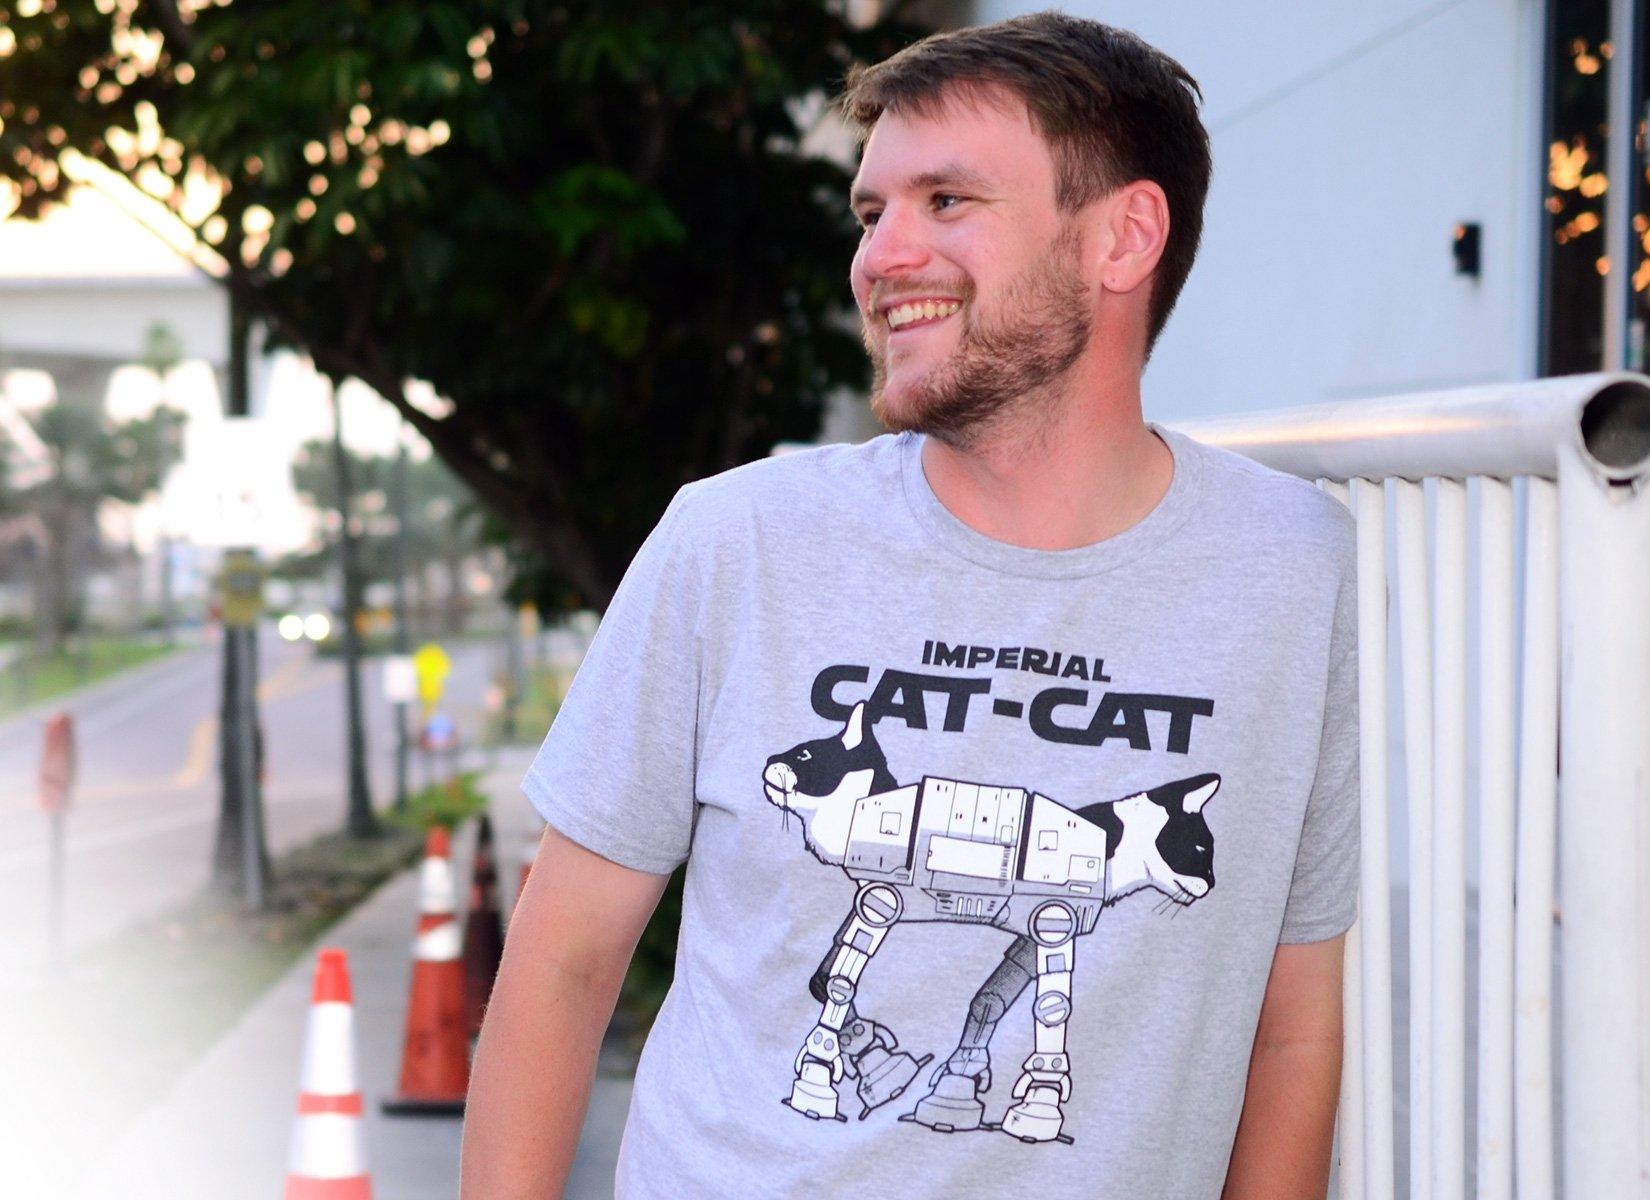 Cat-Cat on Mens T-Shirt